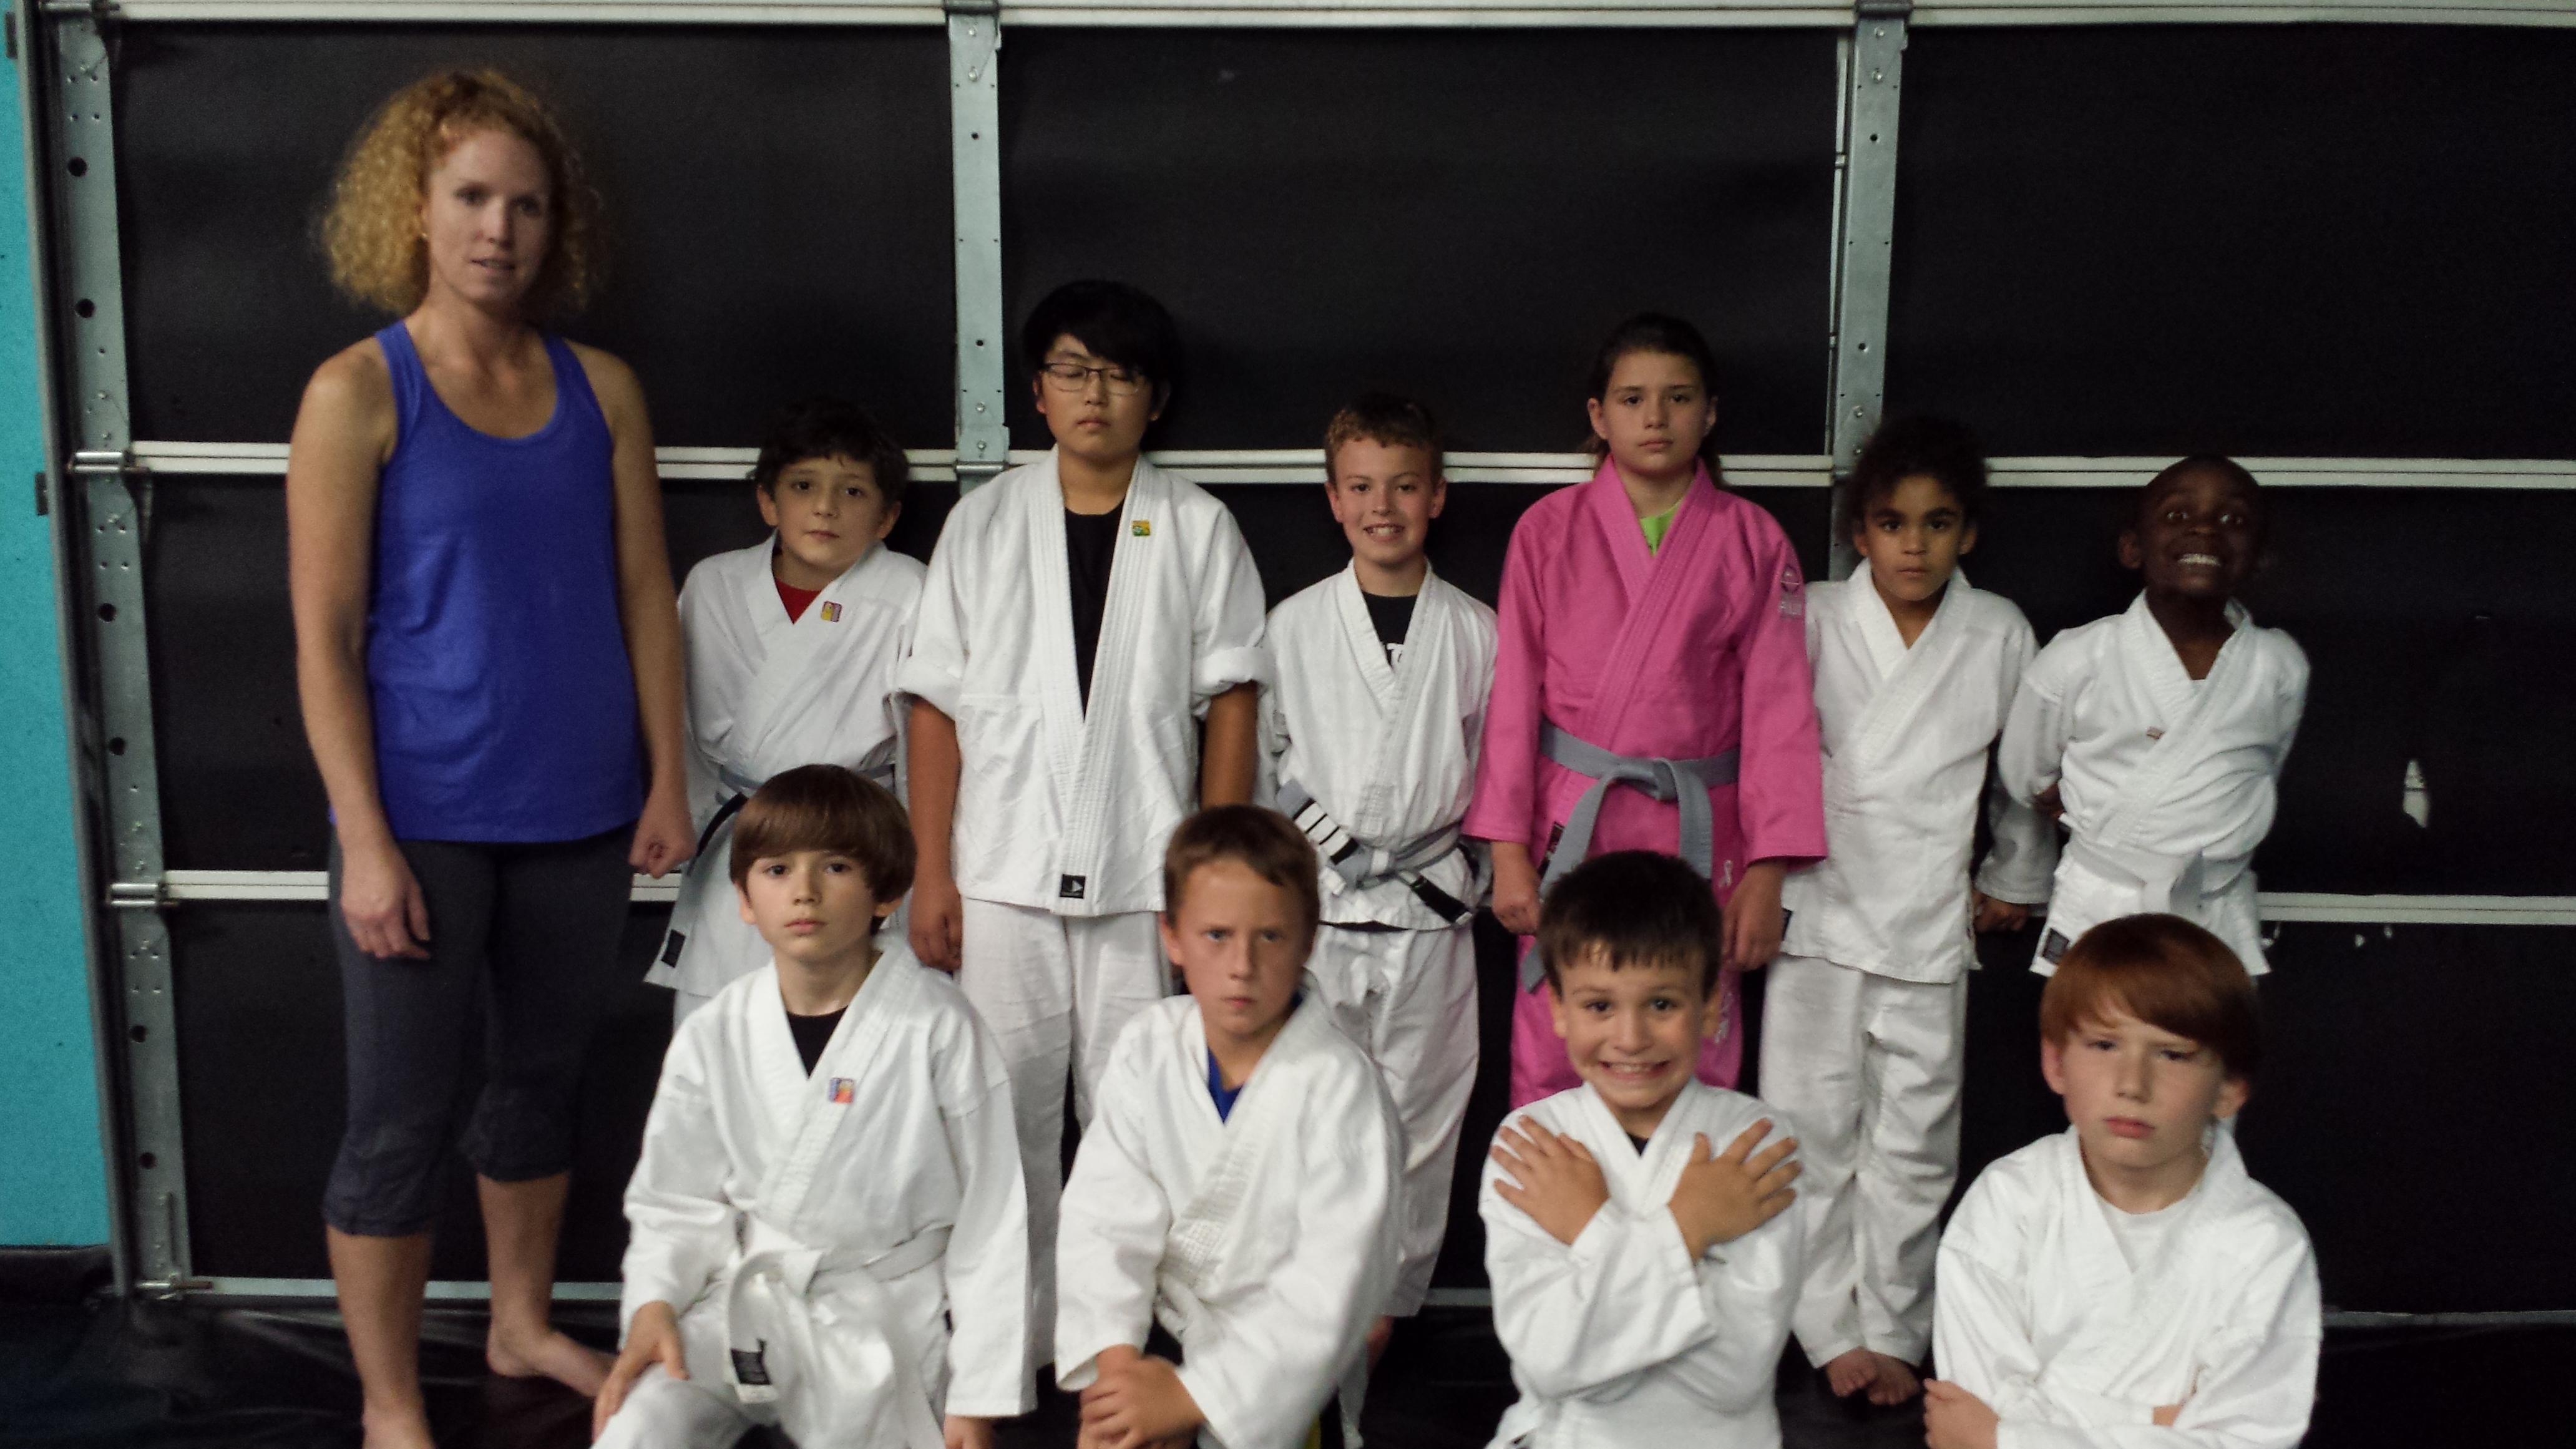 Child Martial Arts Prodigy